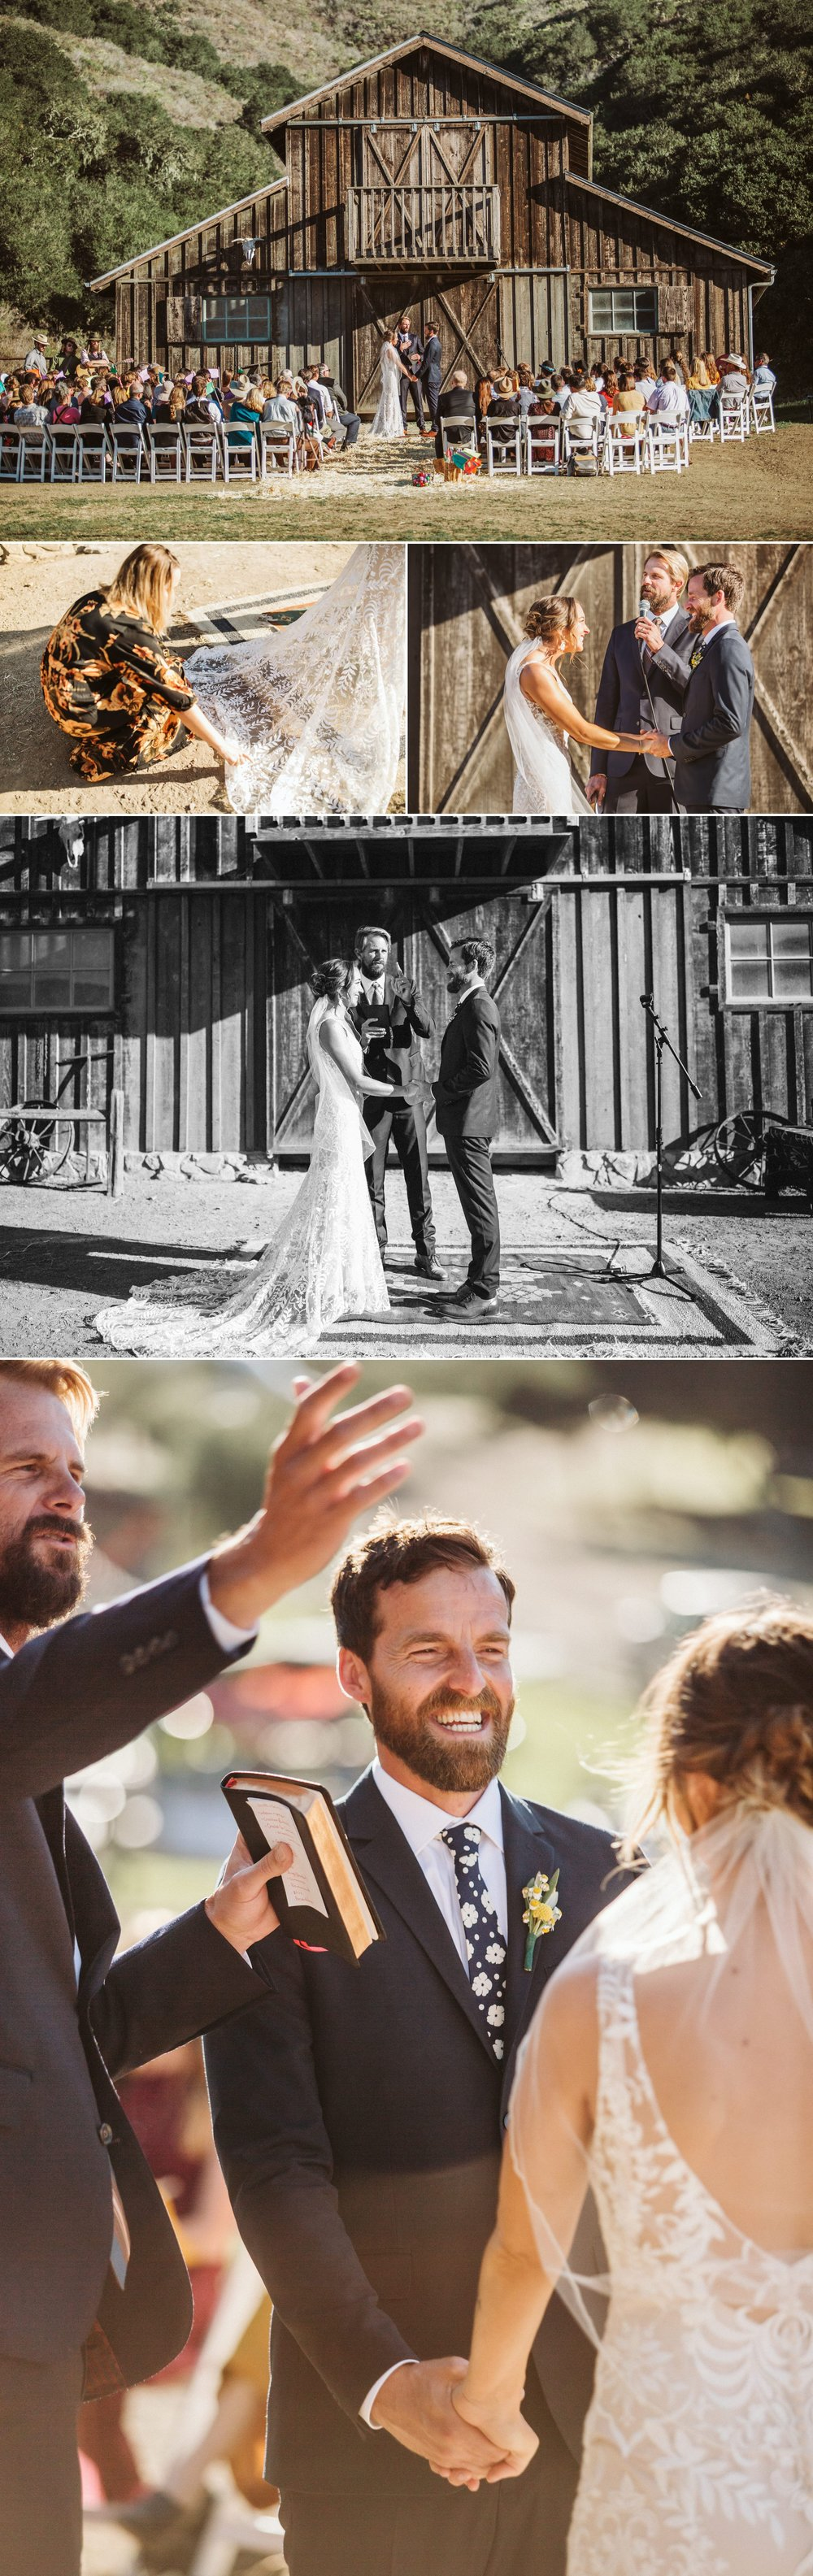 Colorful Barn Wedding at Jalama Canon Ranch- Lompoc- Santa Barbara- Geoff & Lauren 17.jpg